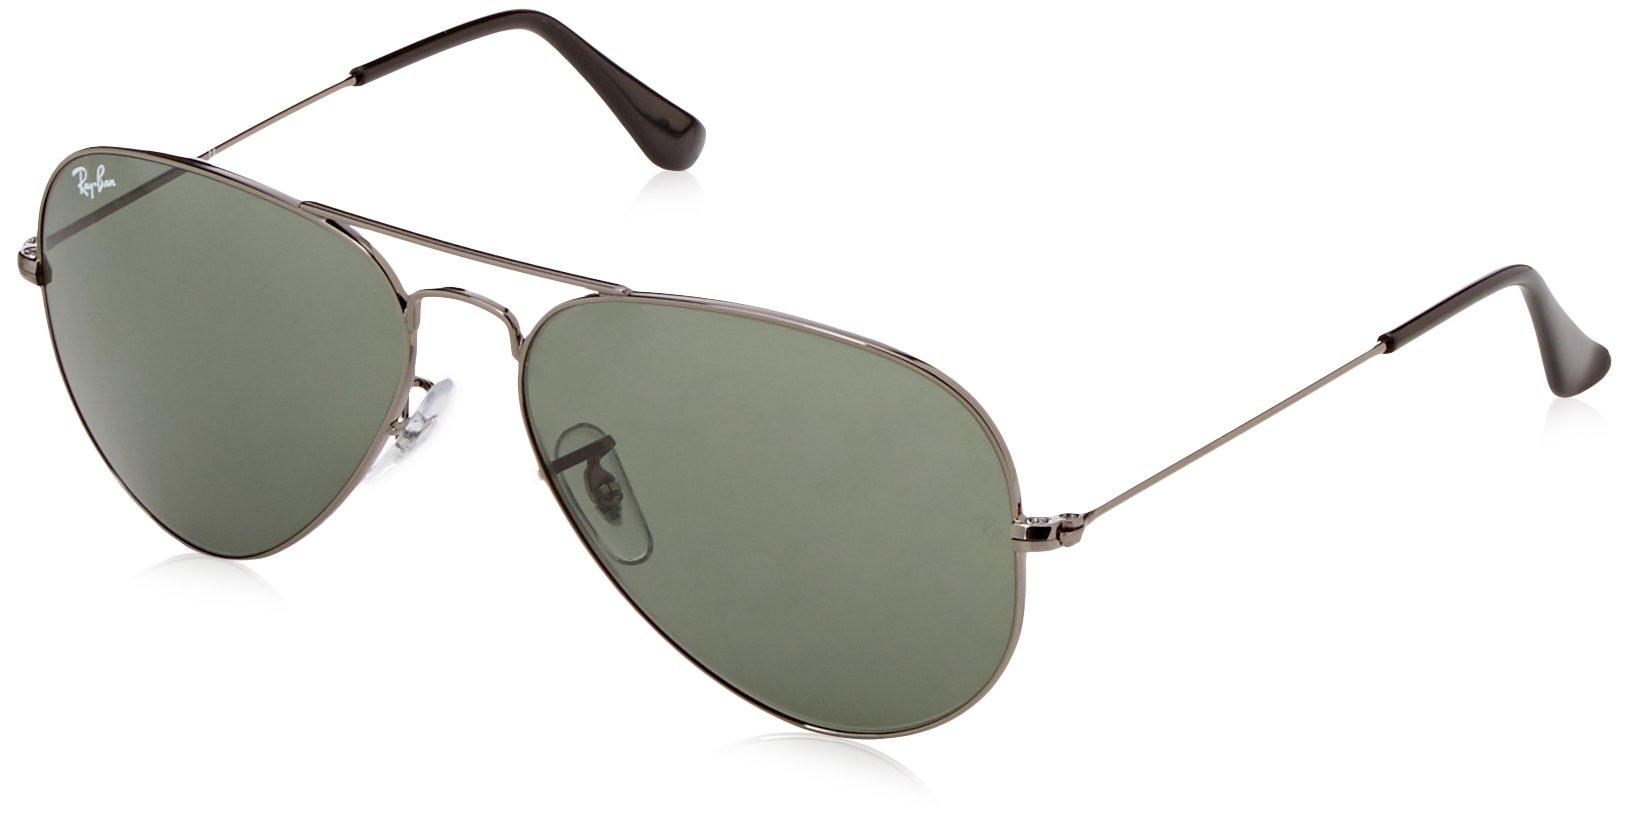 Rayban Aviator Sunglasses: Amazon.co.uk